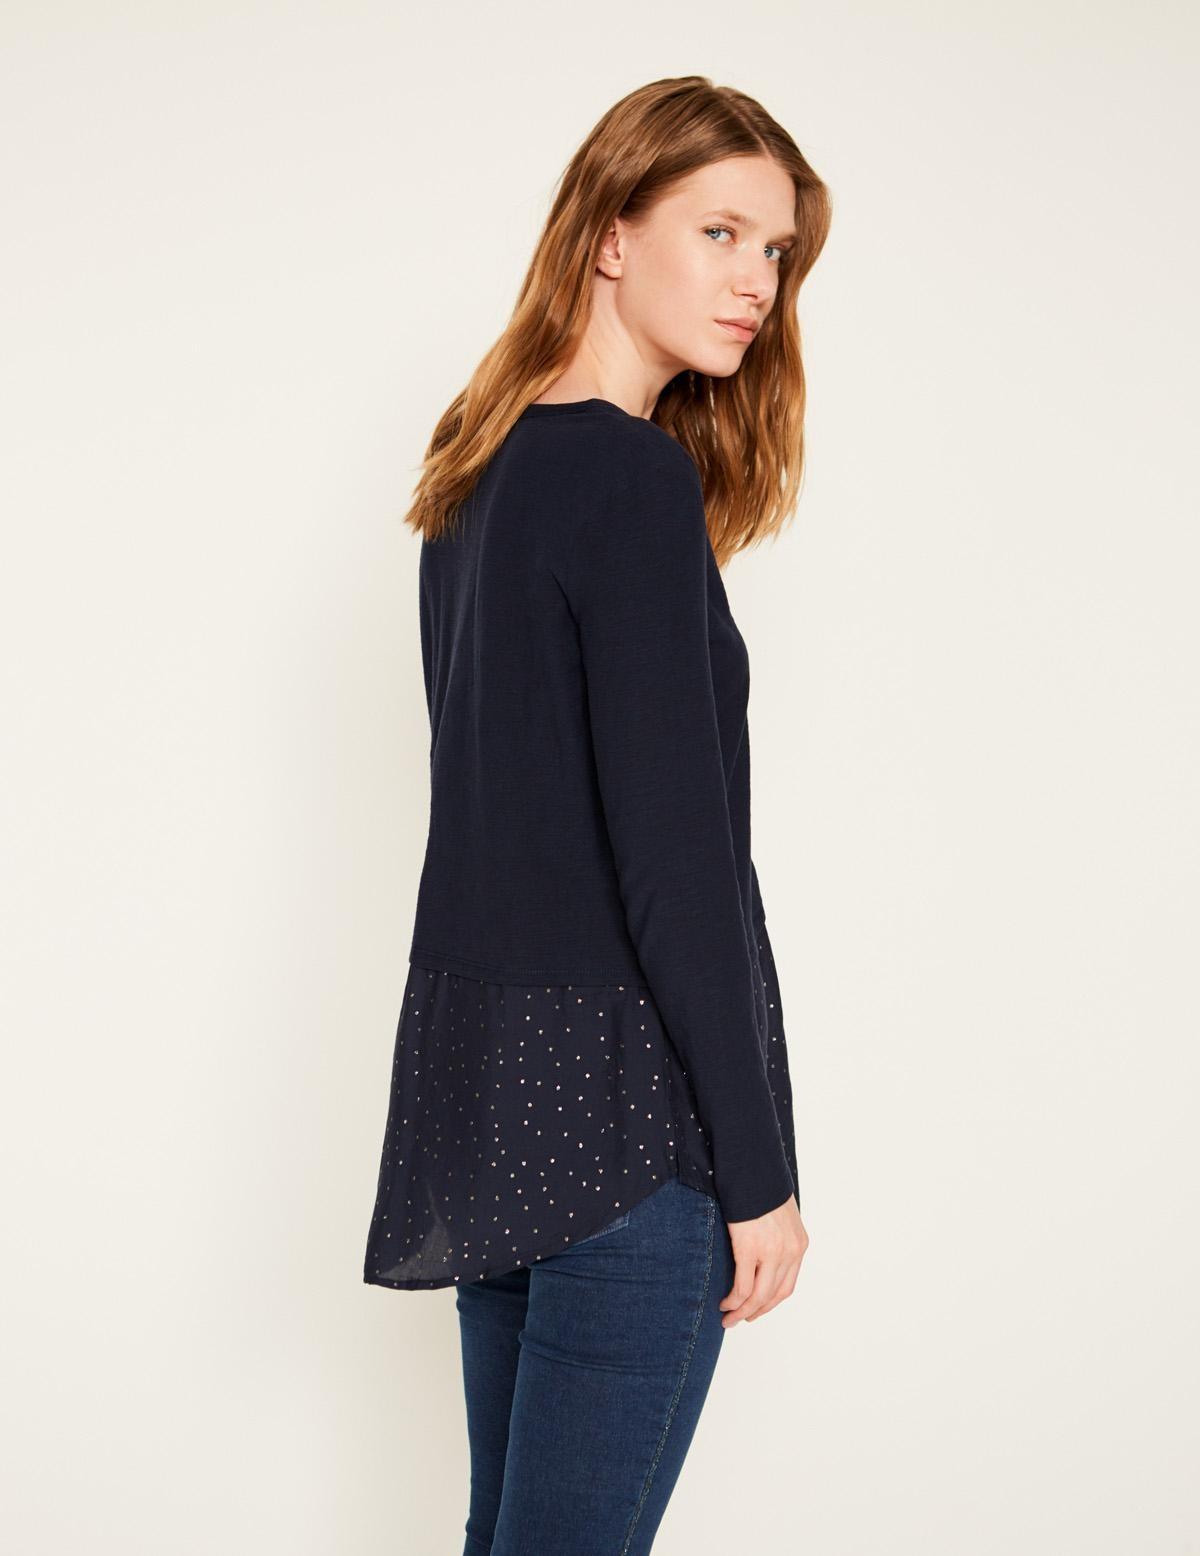 Camisa bimateria - Ítem1